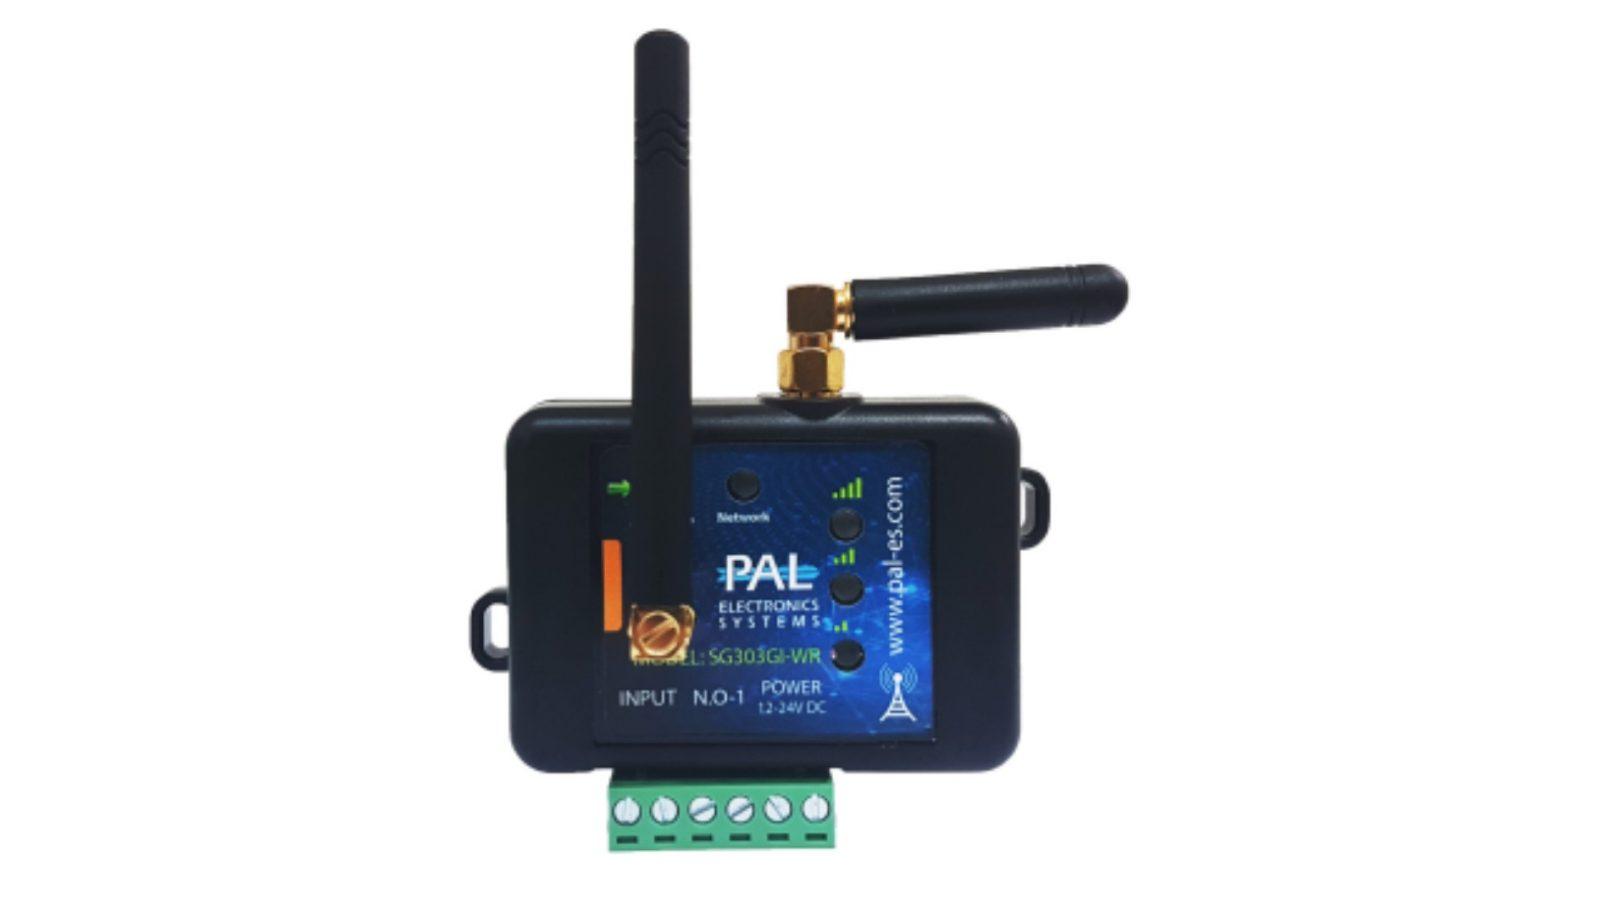 PalGate SG314GI-WR mobile phone access control